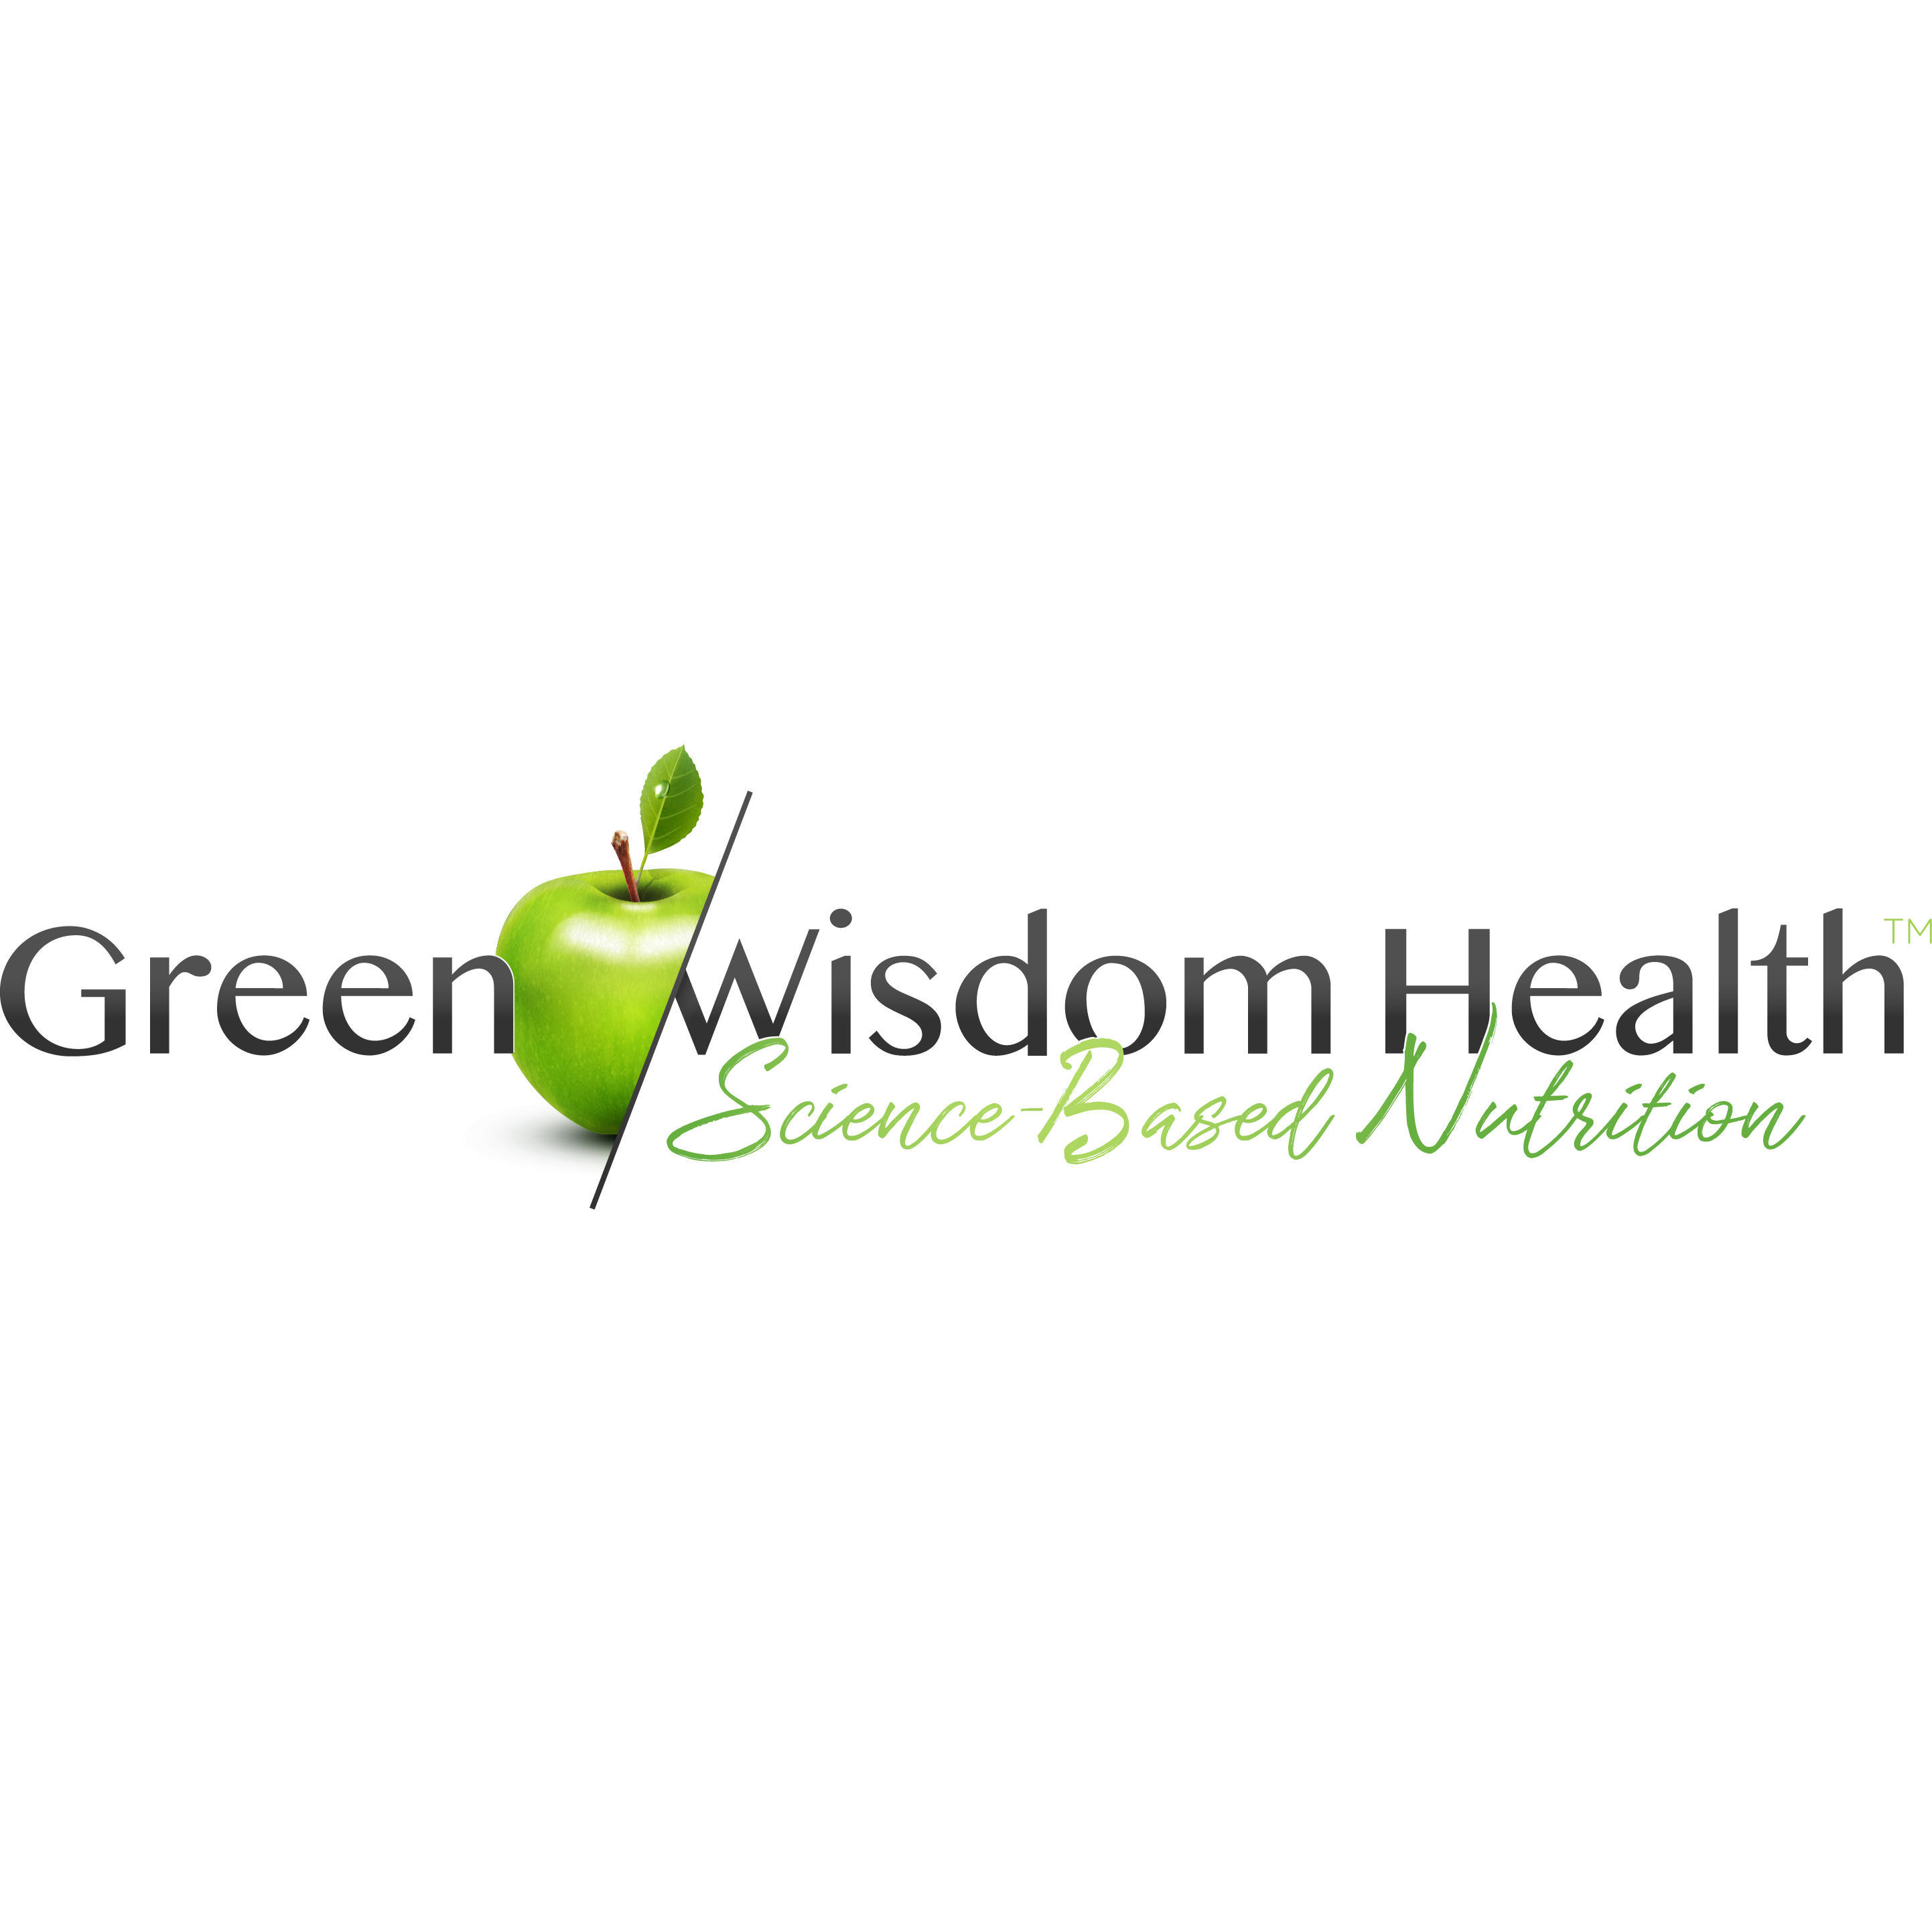 Green Wisdom Health image 2